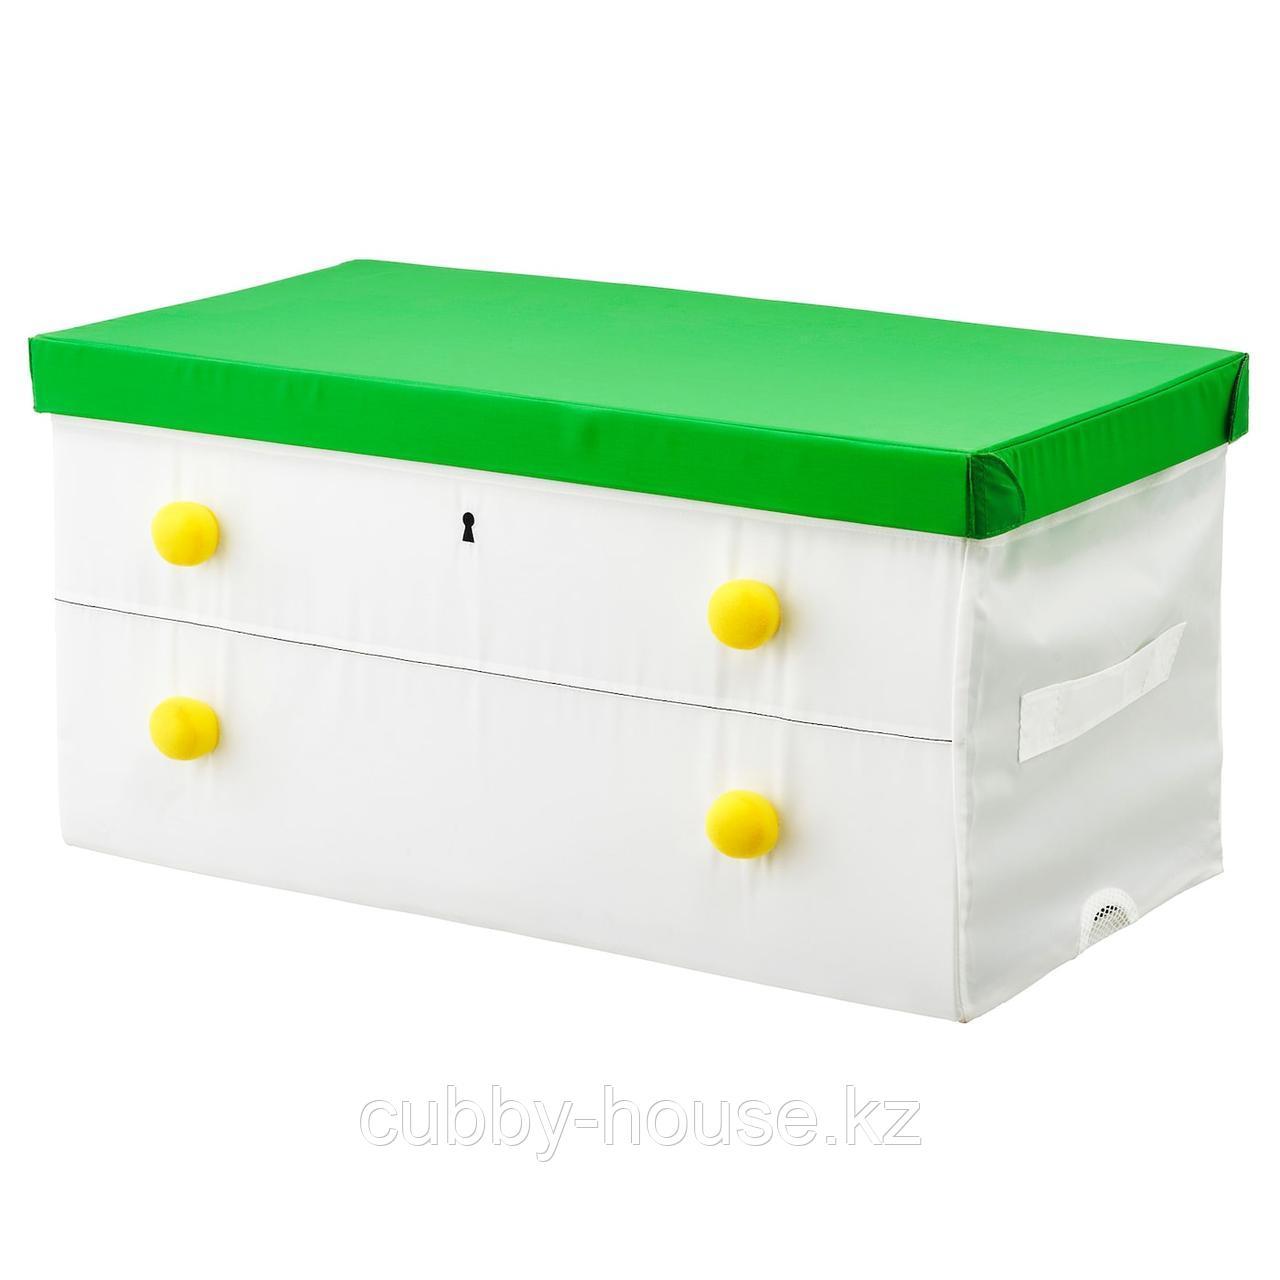 ФЛЮТТБАР Коробка с крышкой, зеленый, белый, 79x42x41 см